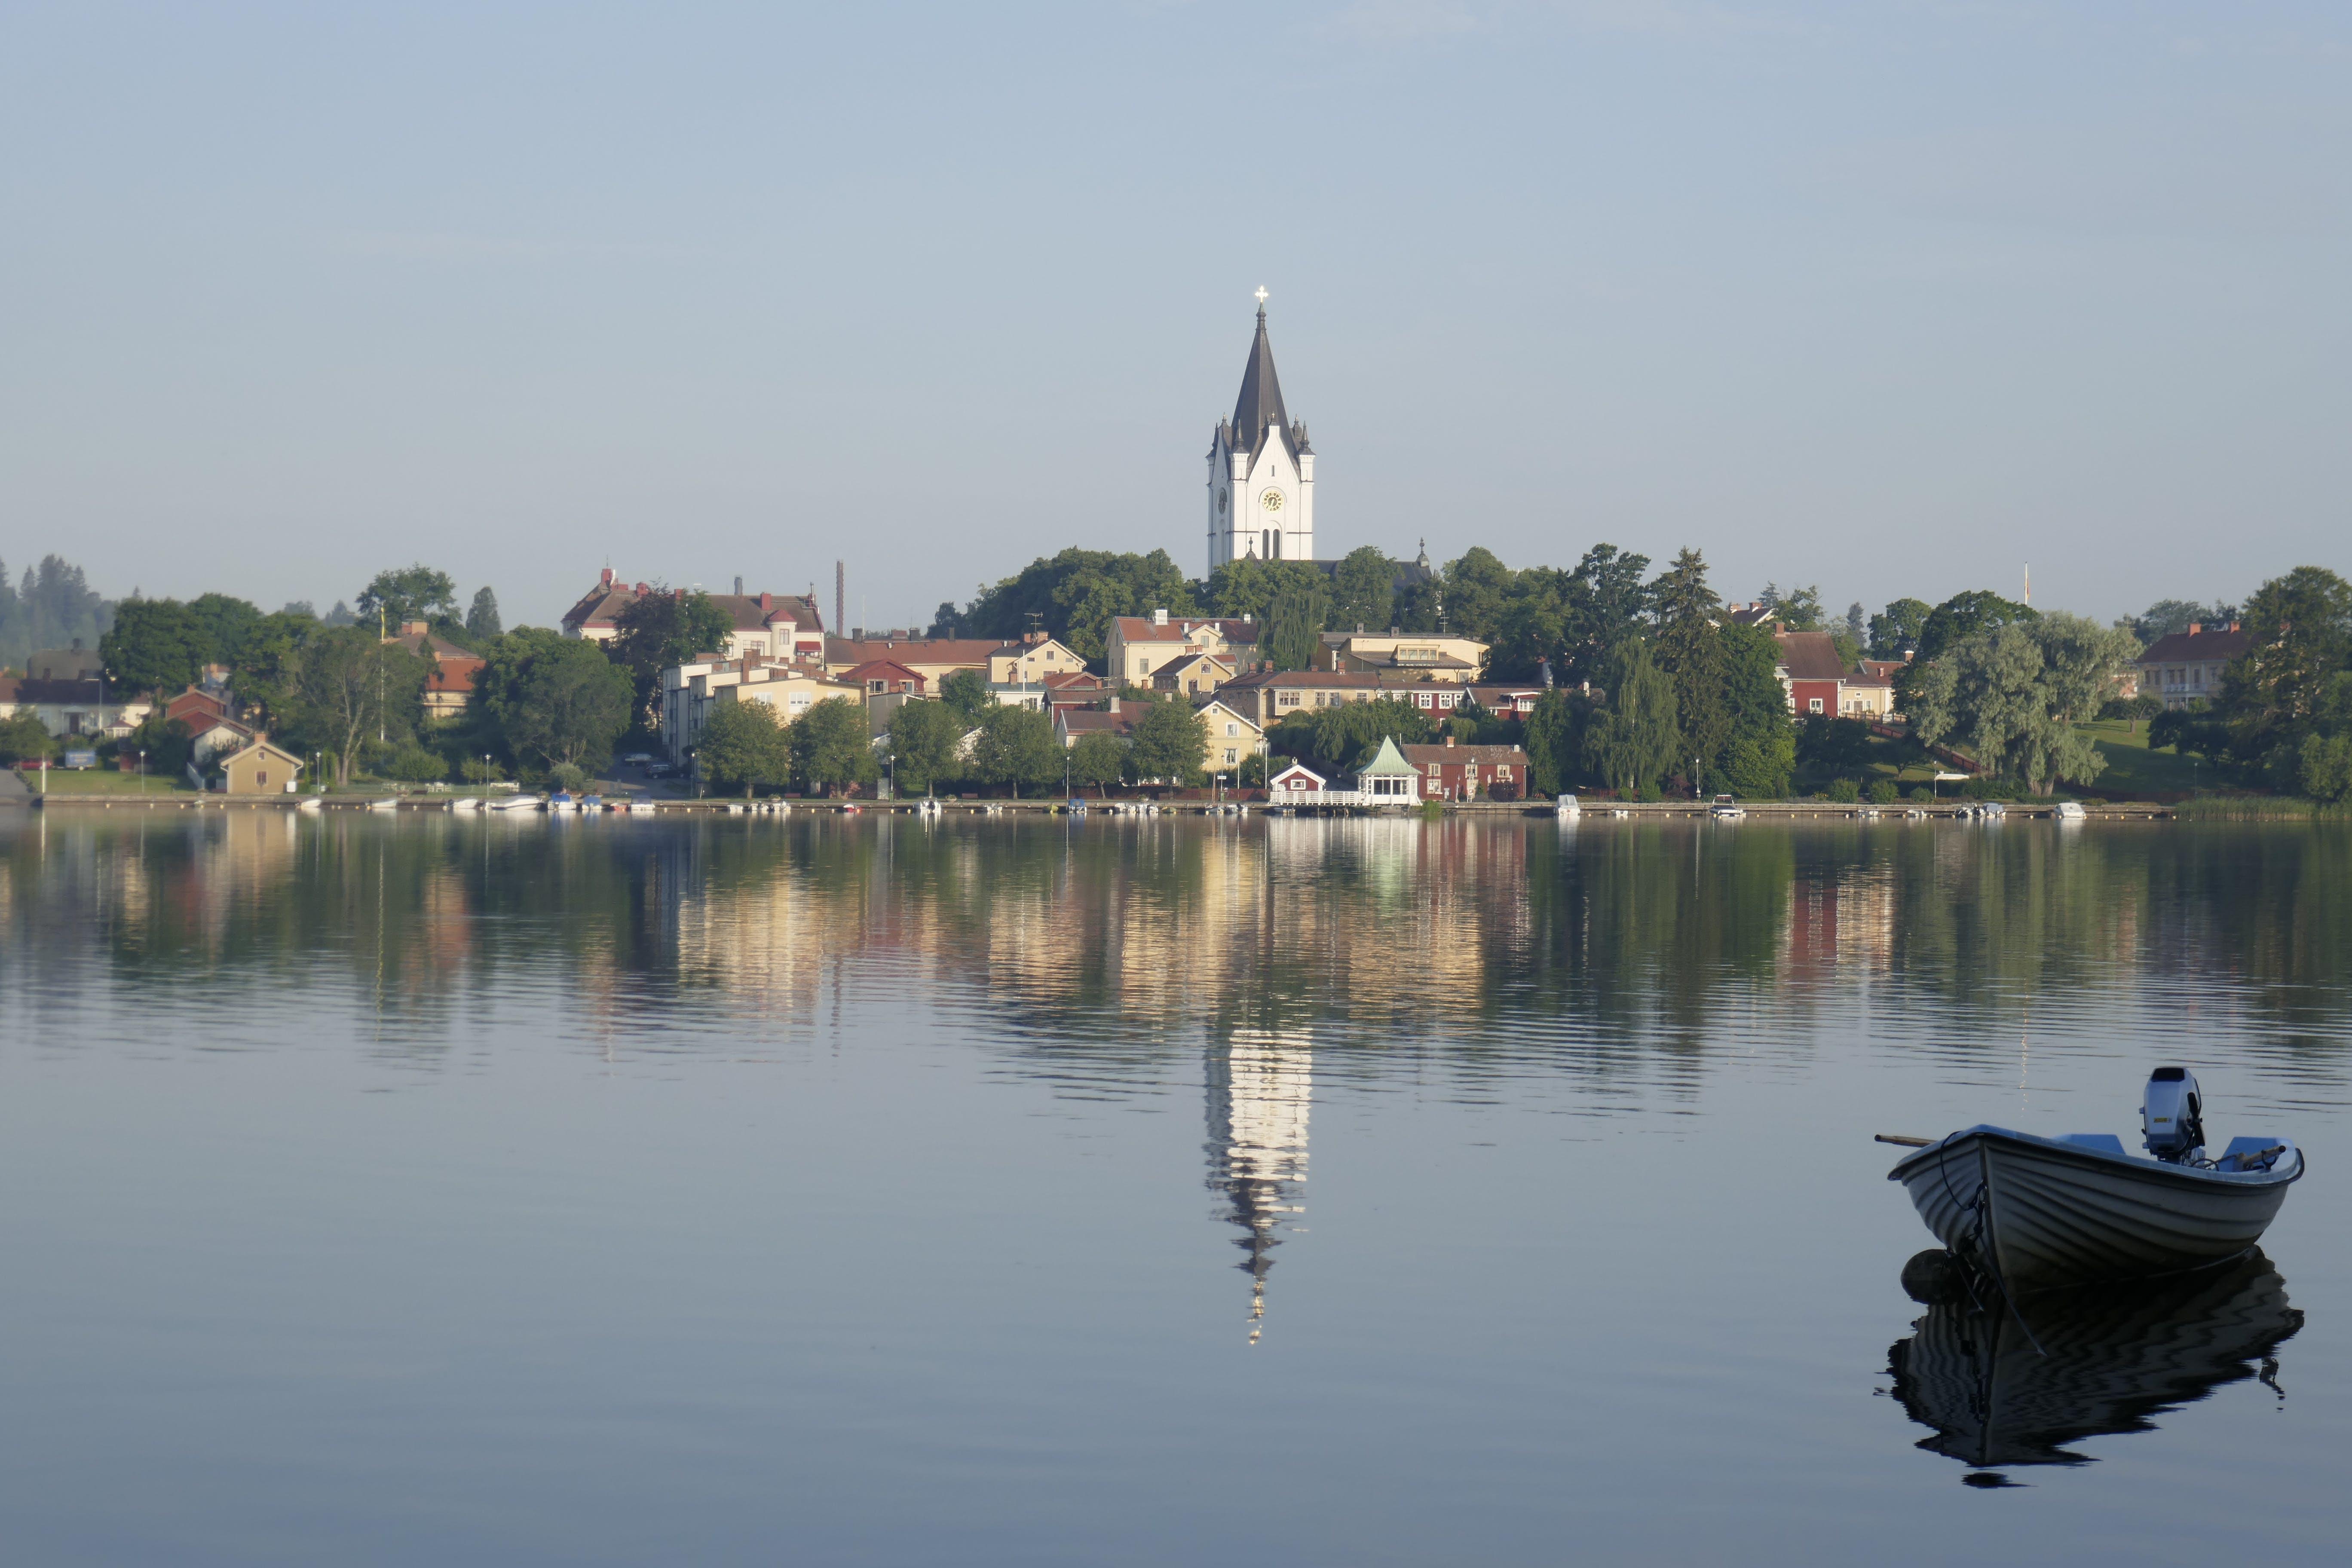 Kostenloses Stock Foto zu boot, kirchturm, schweden